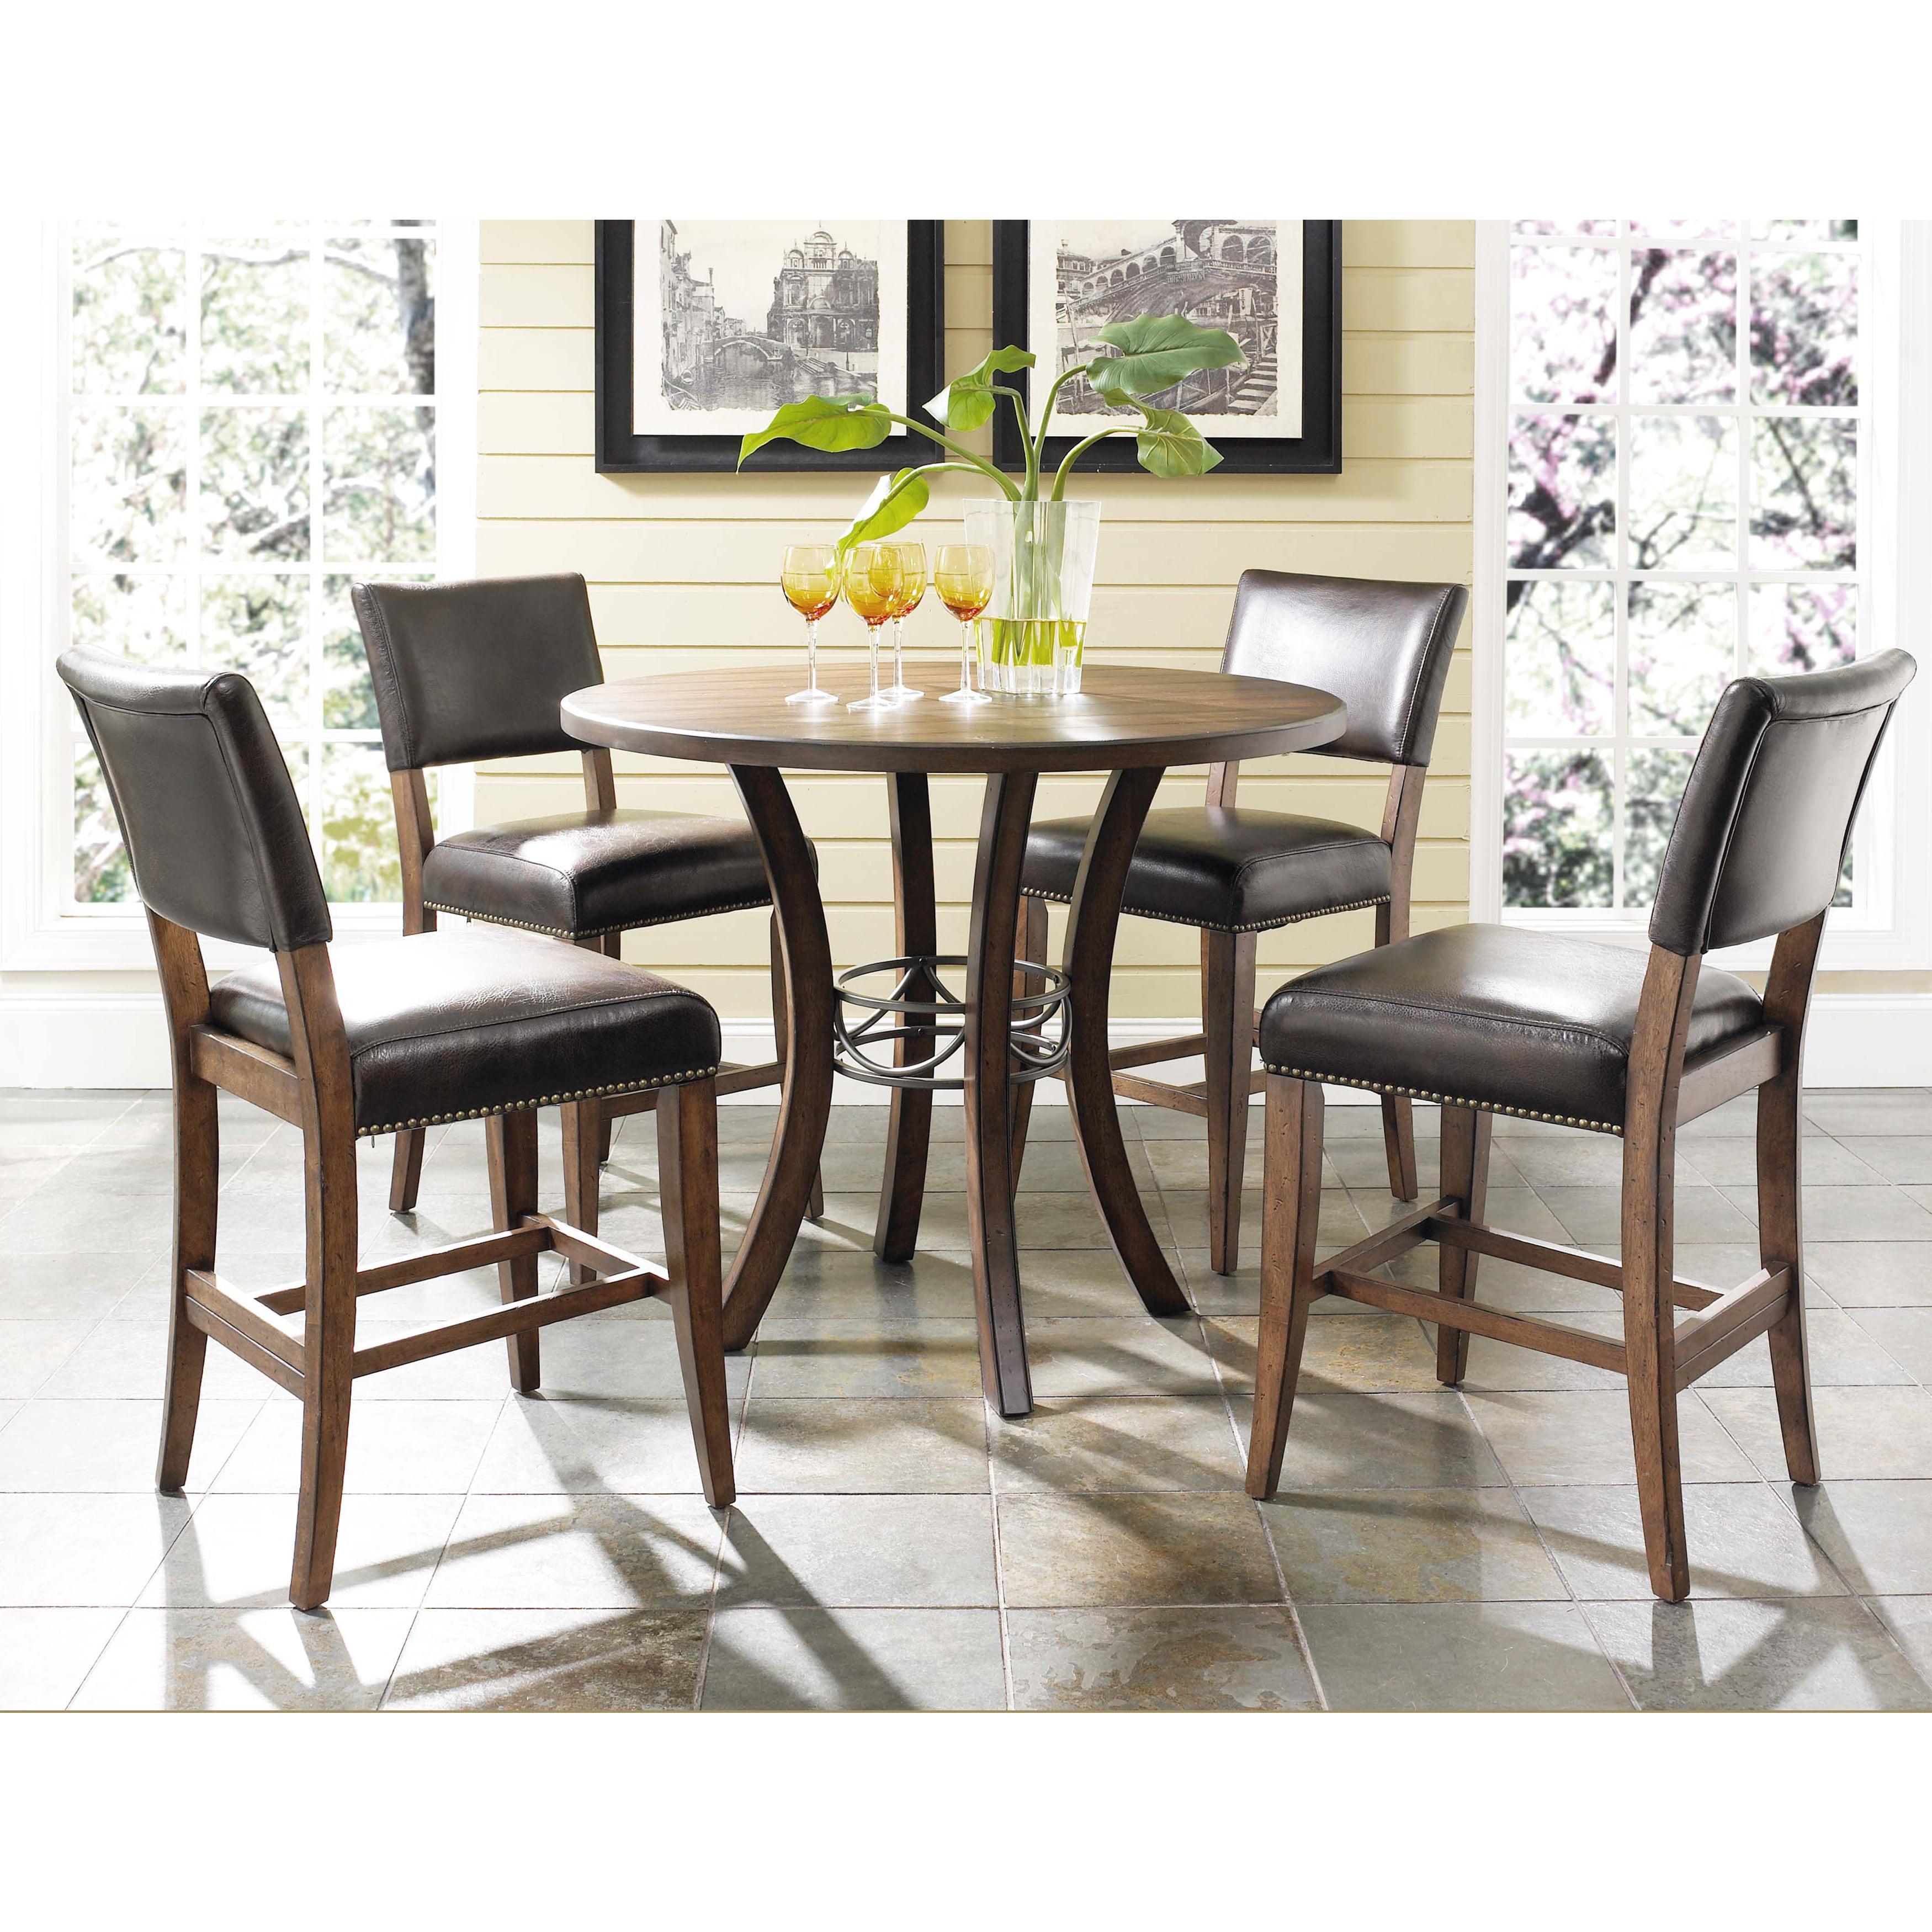 Hillsdale Furniture Cameron 5 Piece Counter Height Round Wood Dining Set With Parson Stool Walmart Com Walmart Com